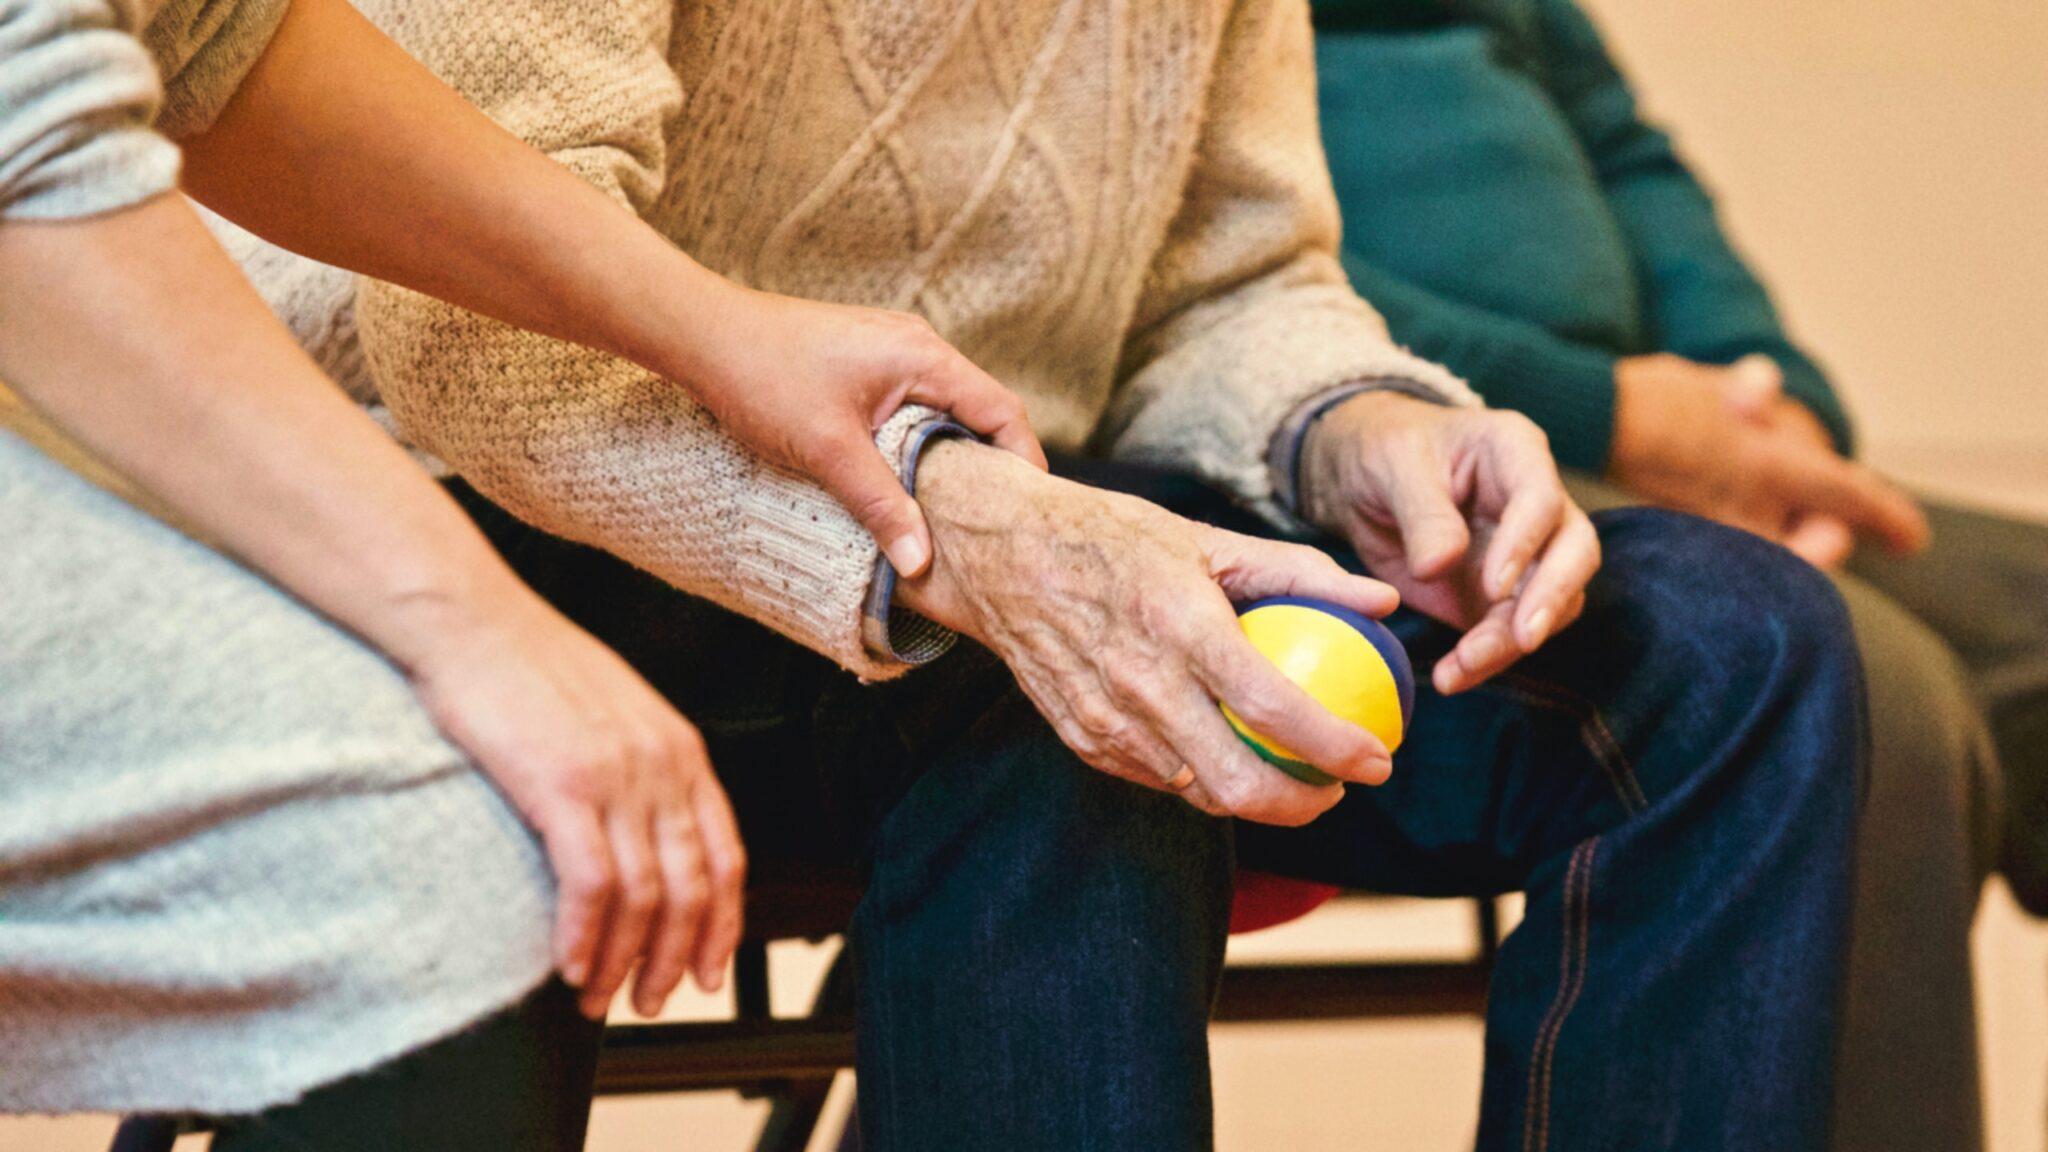 Dementia care at home